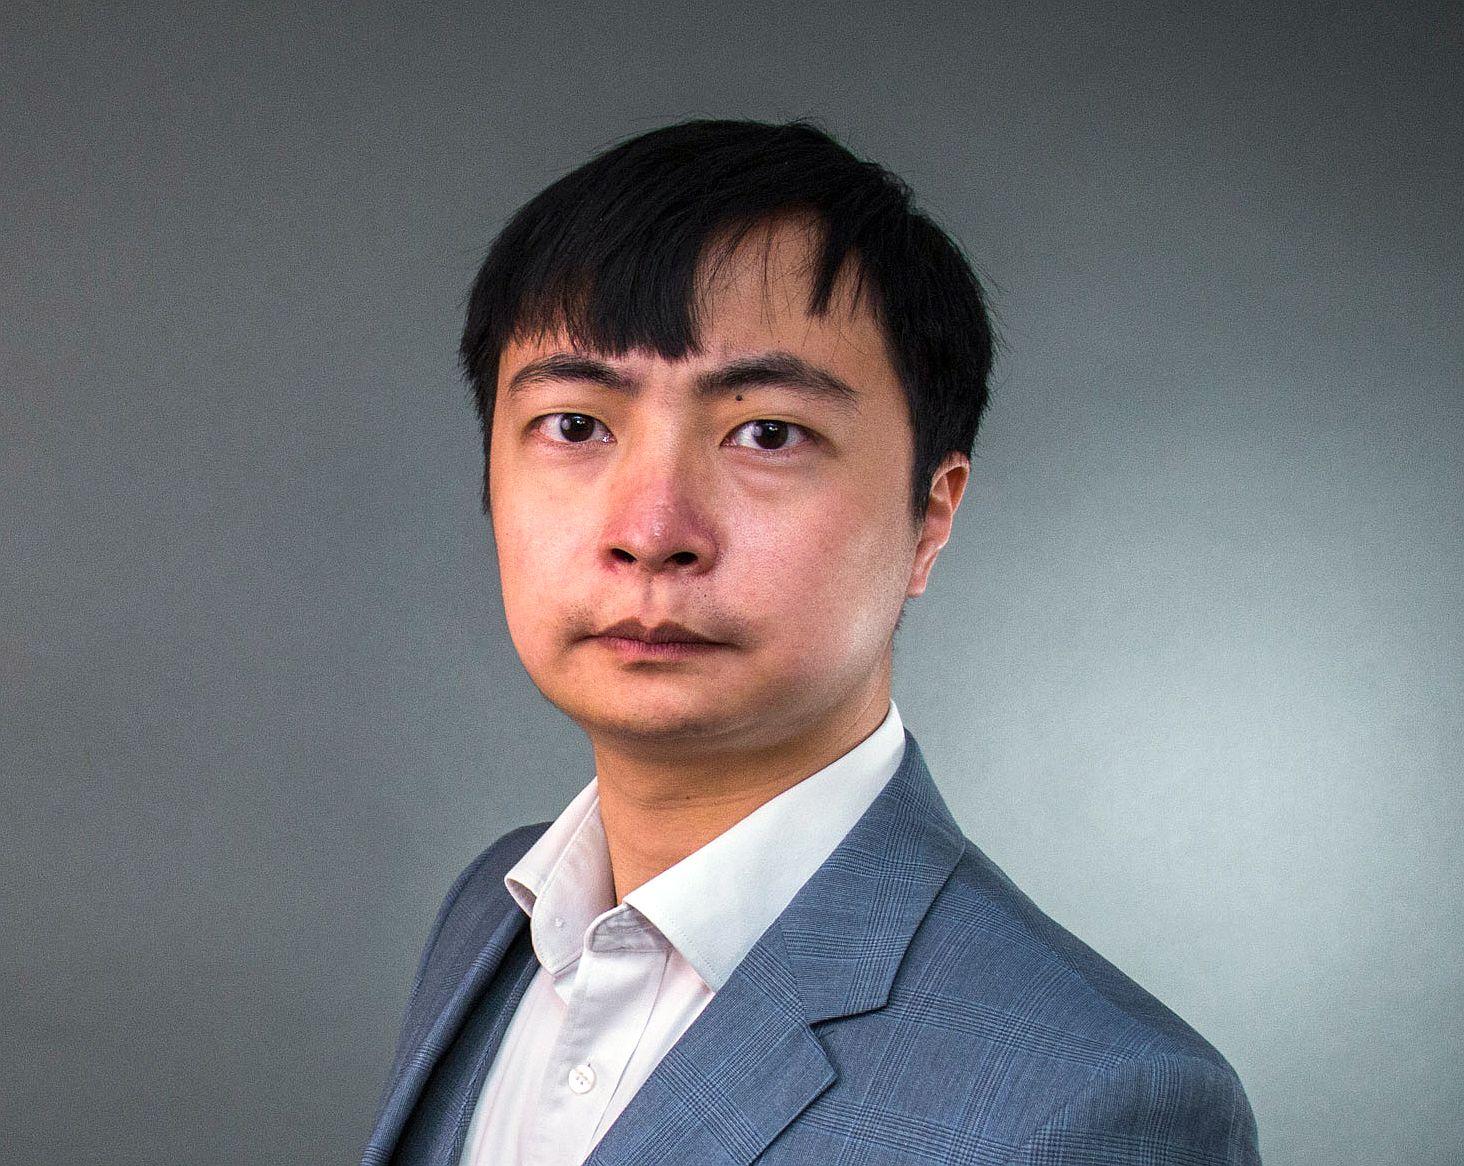 TP-Link România are un nou manager general